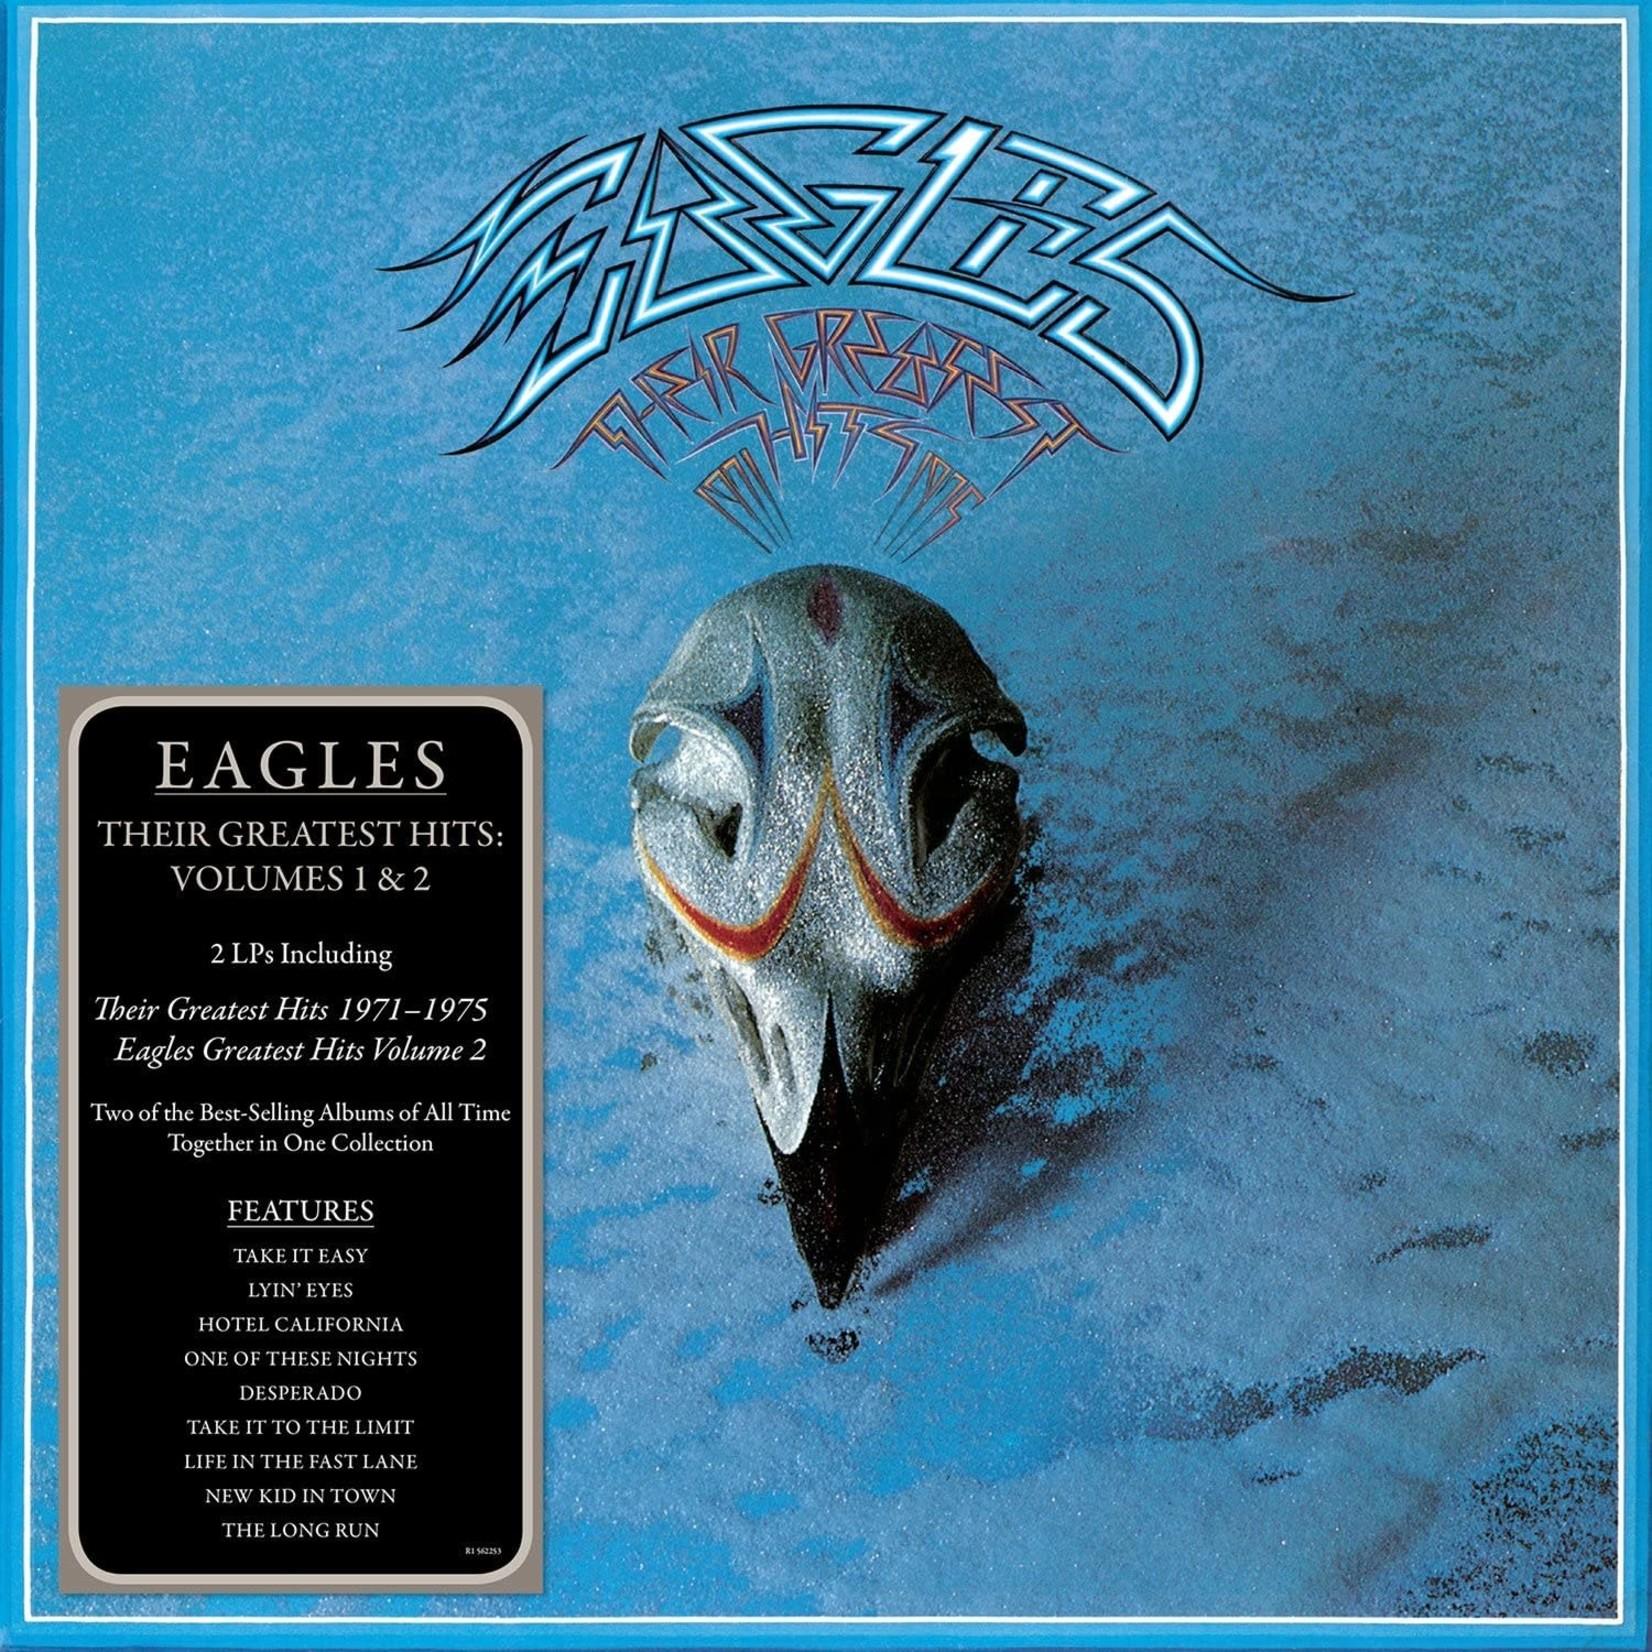 Vinyl The Eagles - Greatest Hits Vol 1 & 2